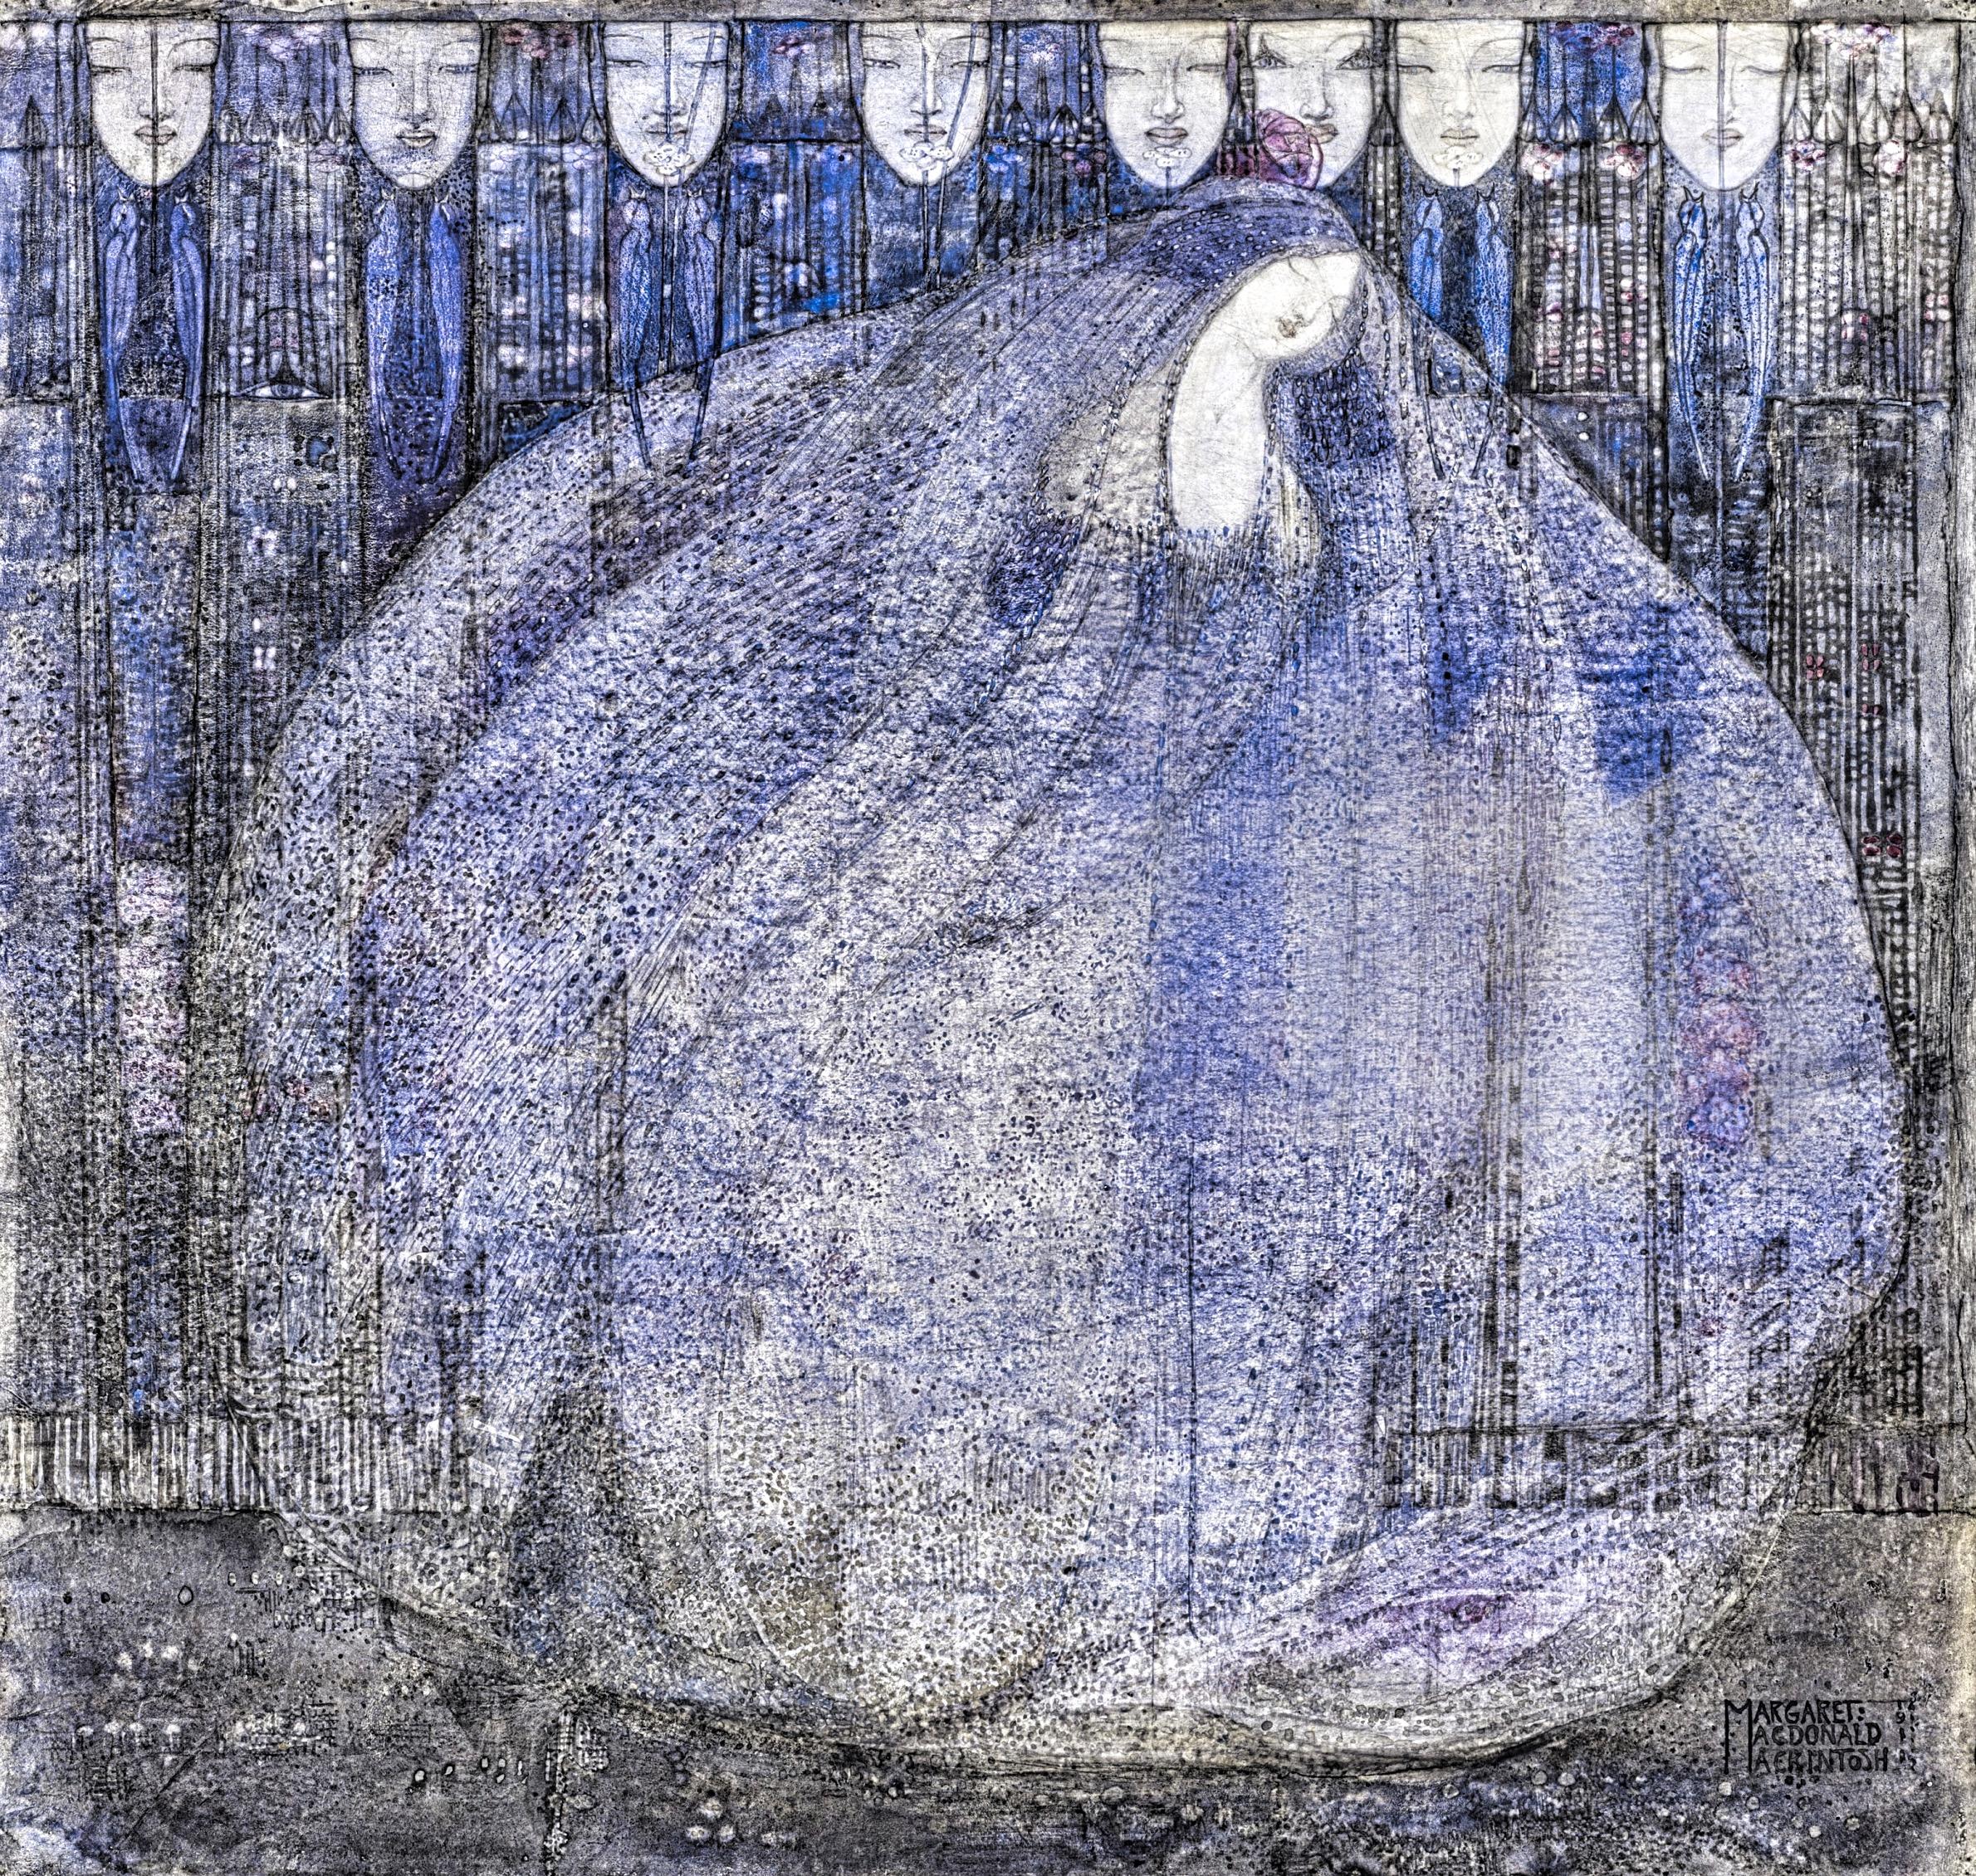 Margaret Macdonald Mackintosh Le Jardin mystérieux